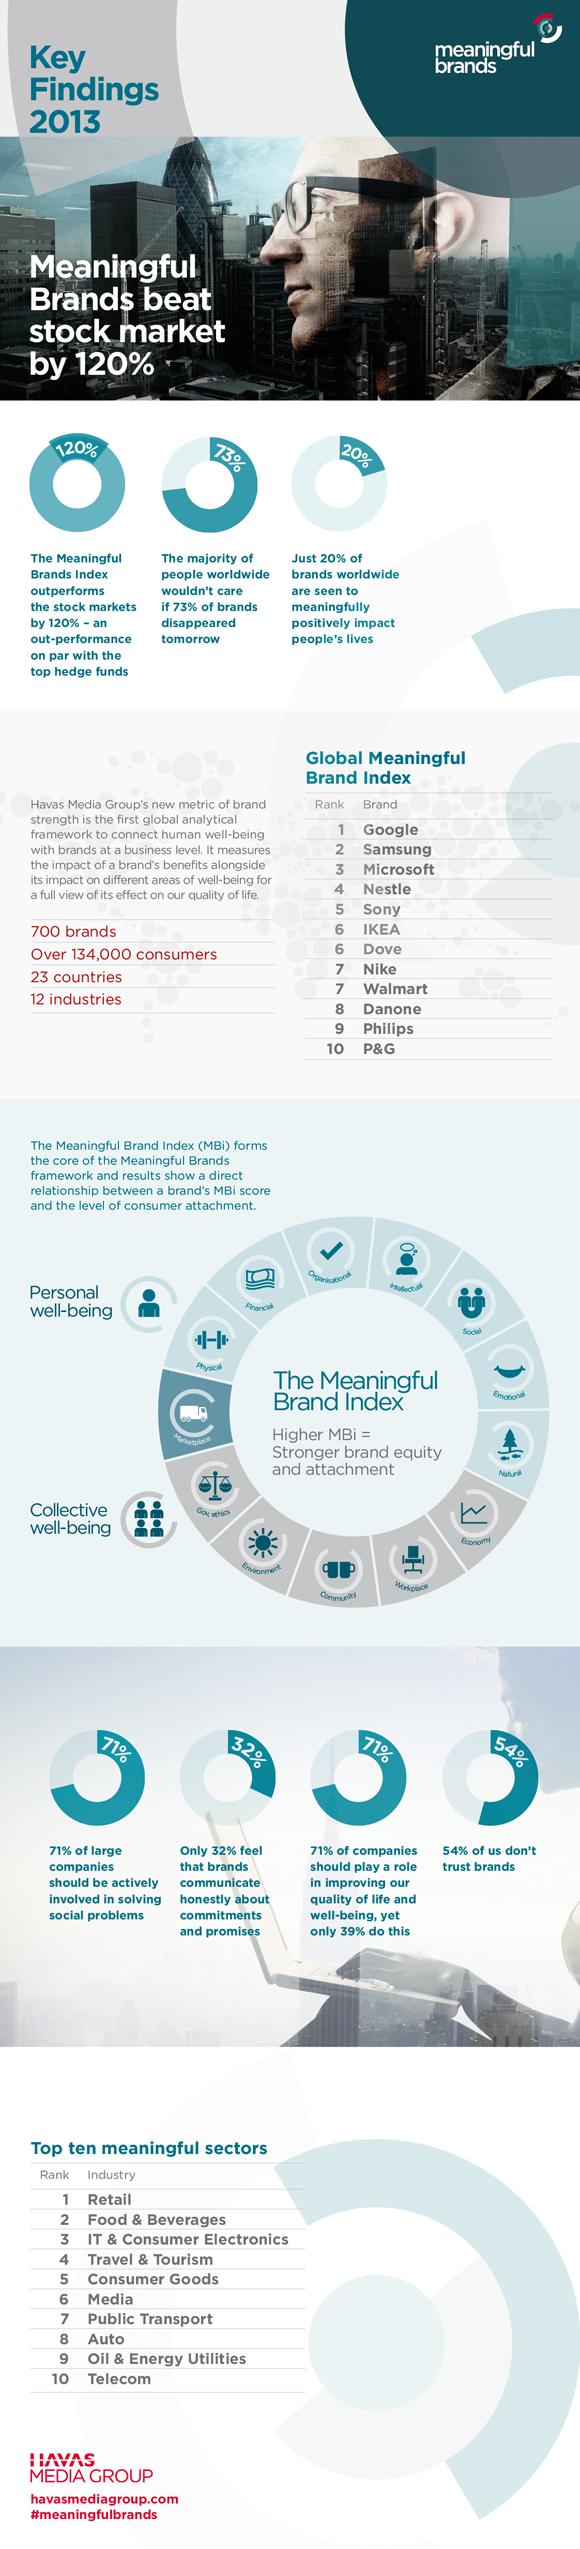 Havas Media Group 2013 Meaningful Brands study